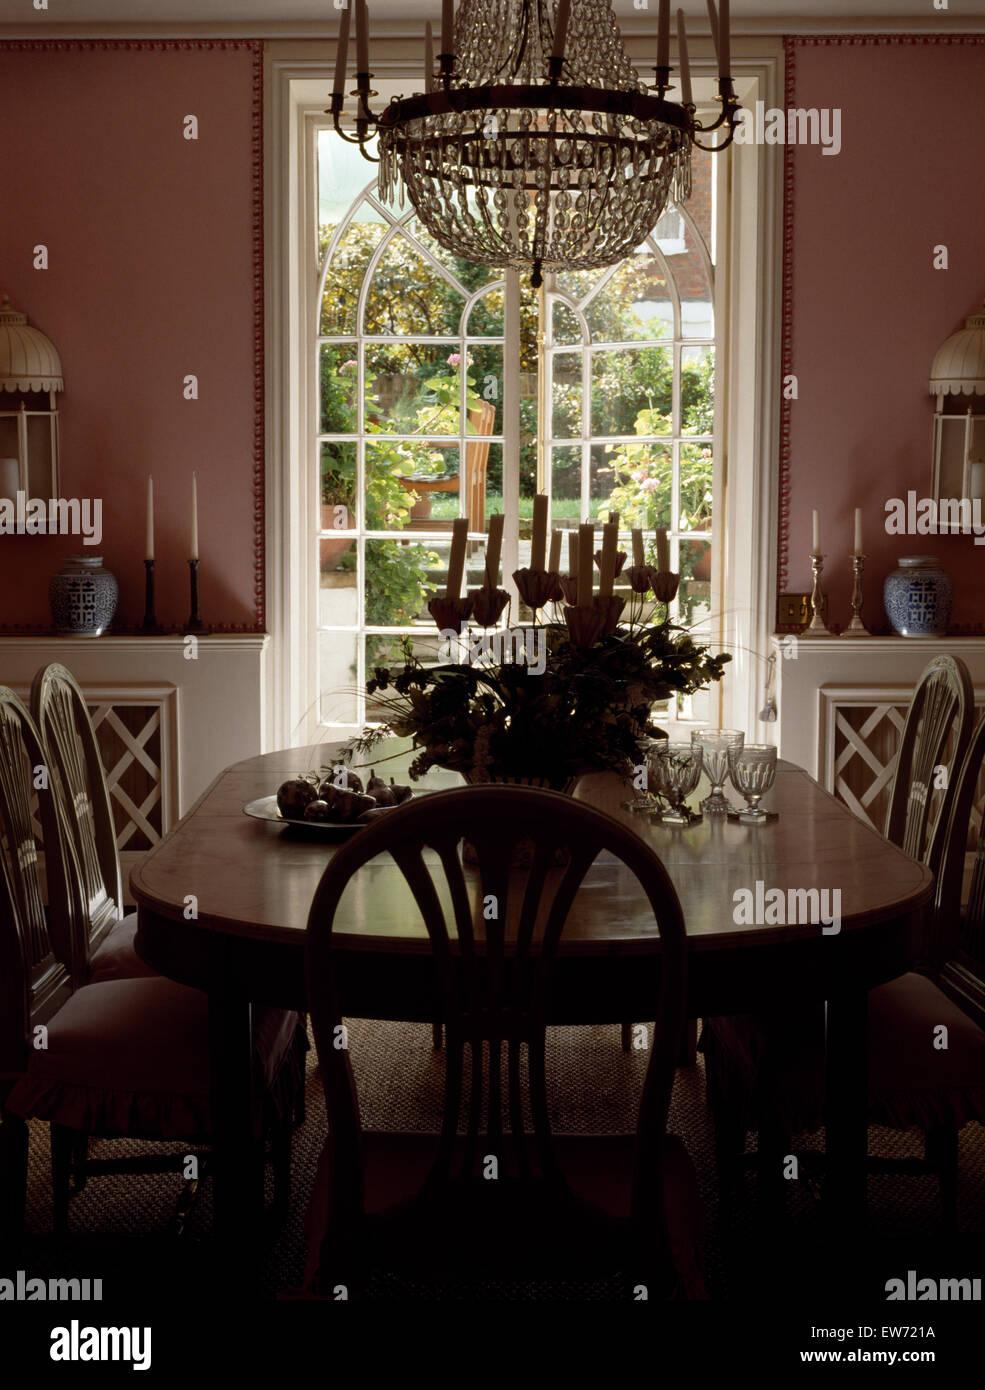 Antique Chandelier And Furniture In Scandinavian Style Nineties Dining Room